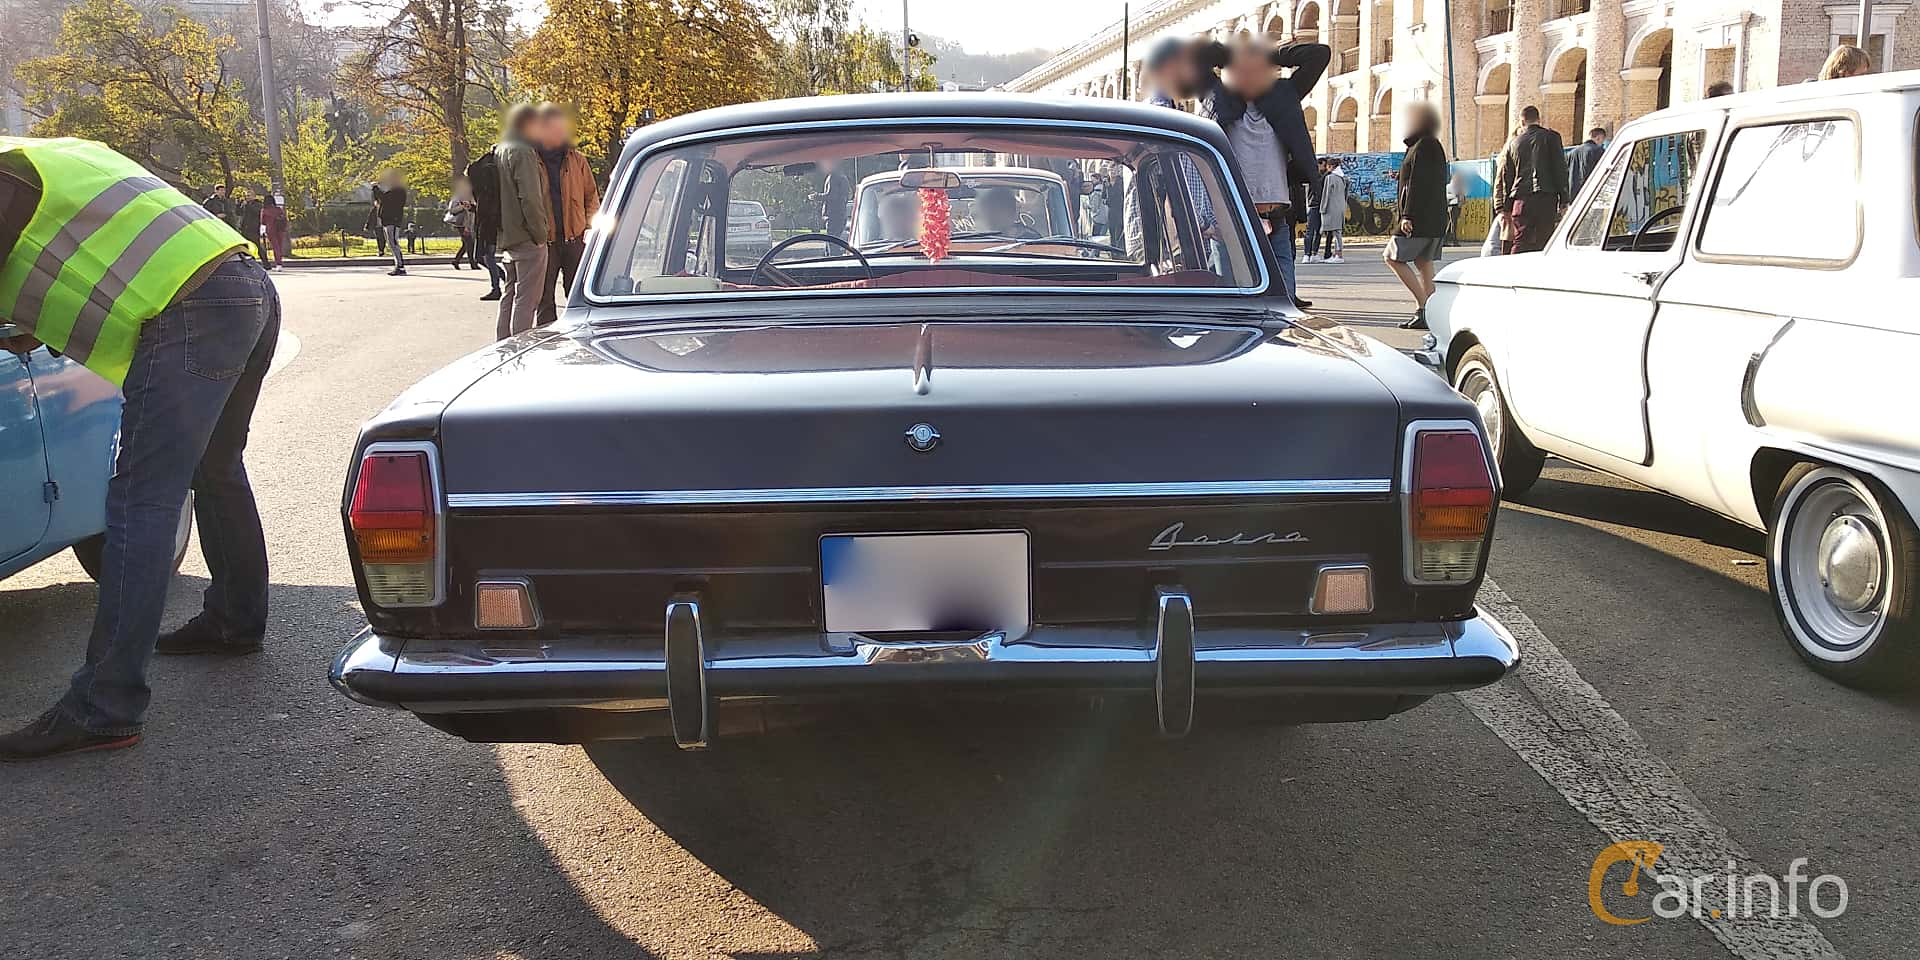 GAZ GAZ-24 2.4 Manuell, 95hk, 1974